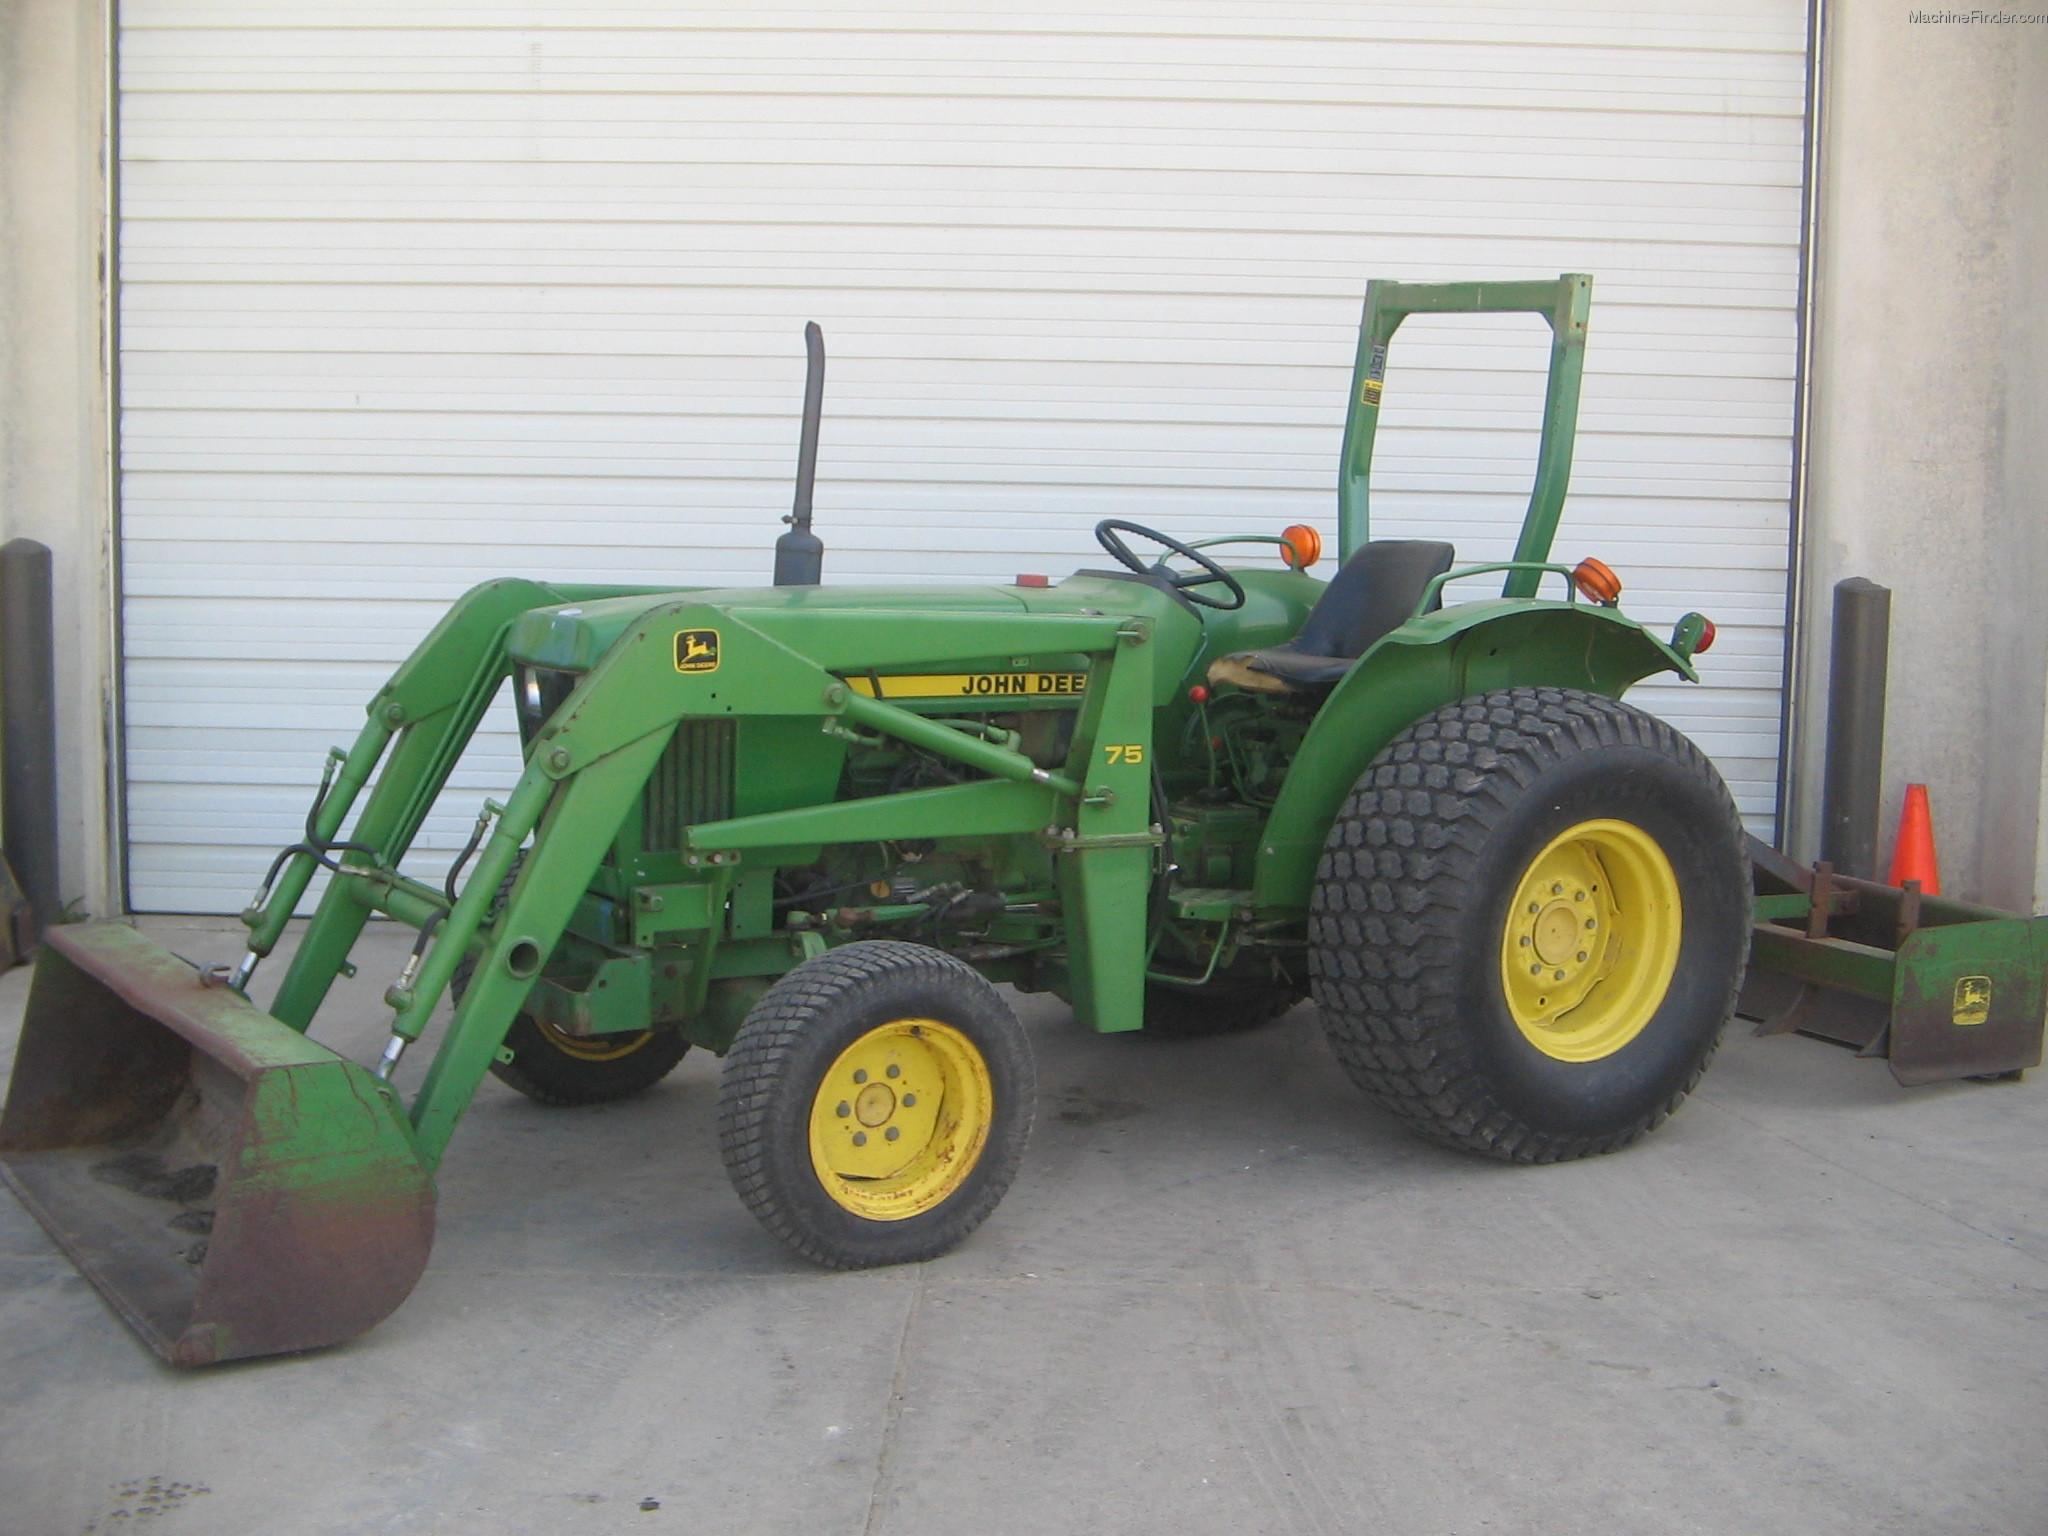 1987 John Deere 1050 Tractors - Compact (1-40hp.) - John ...